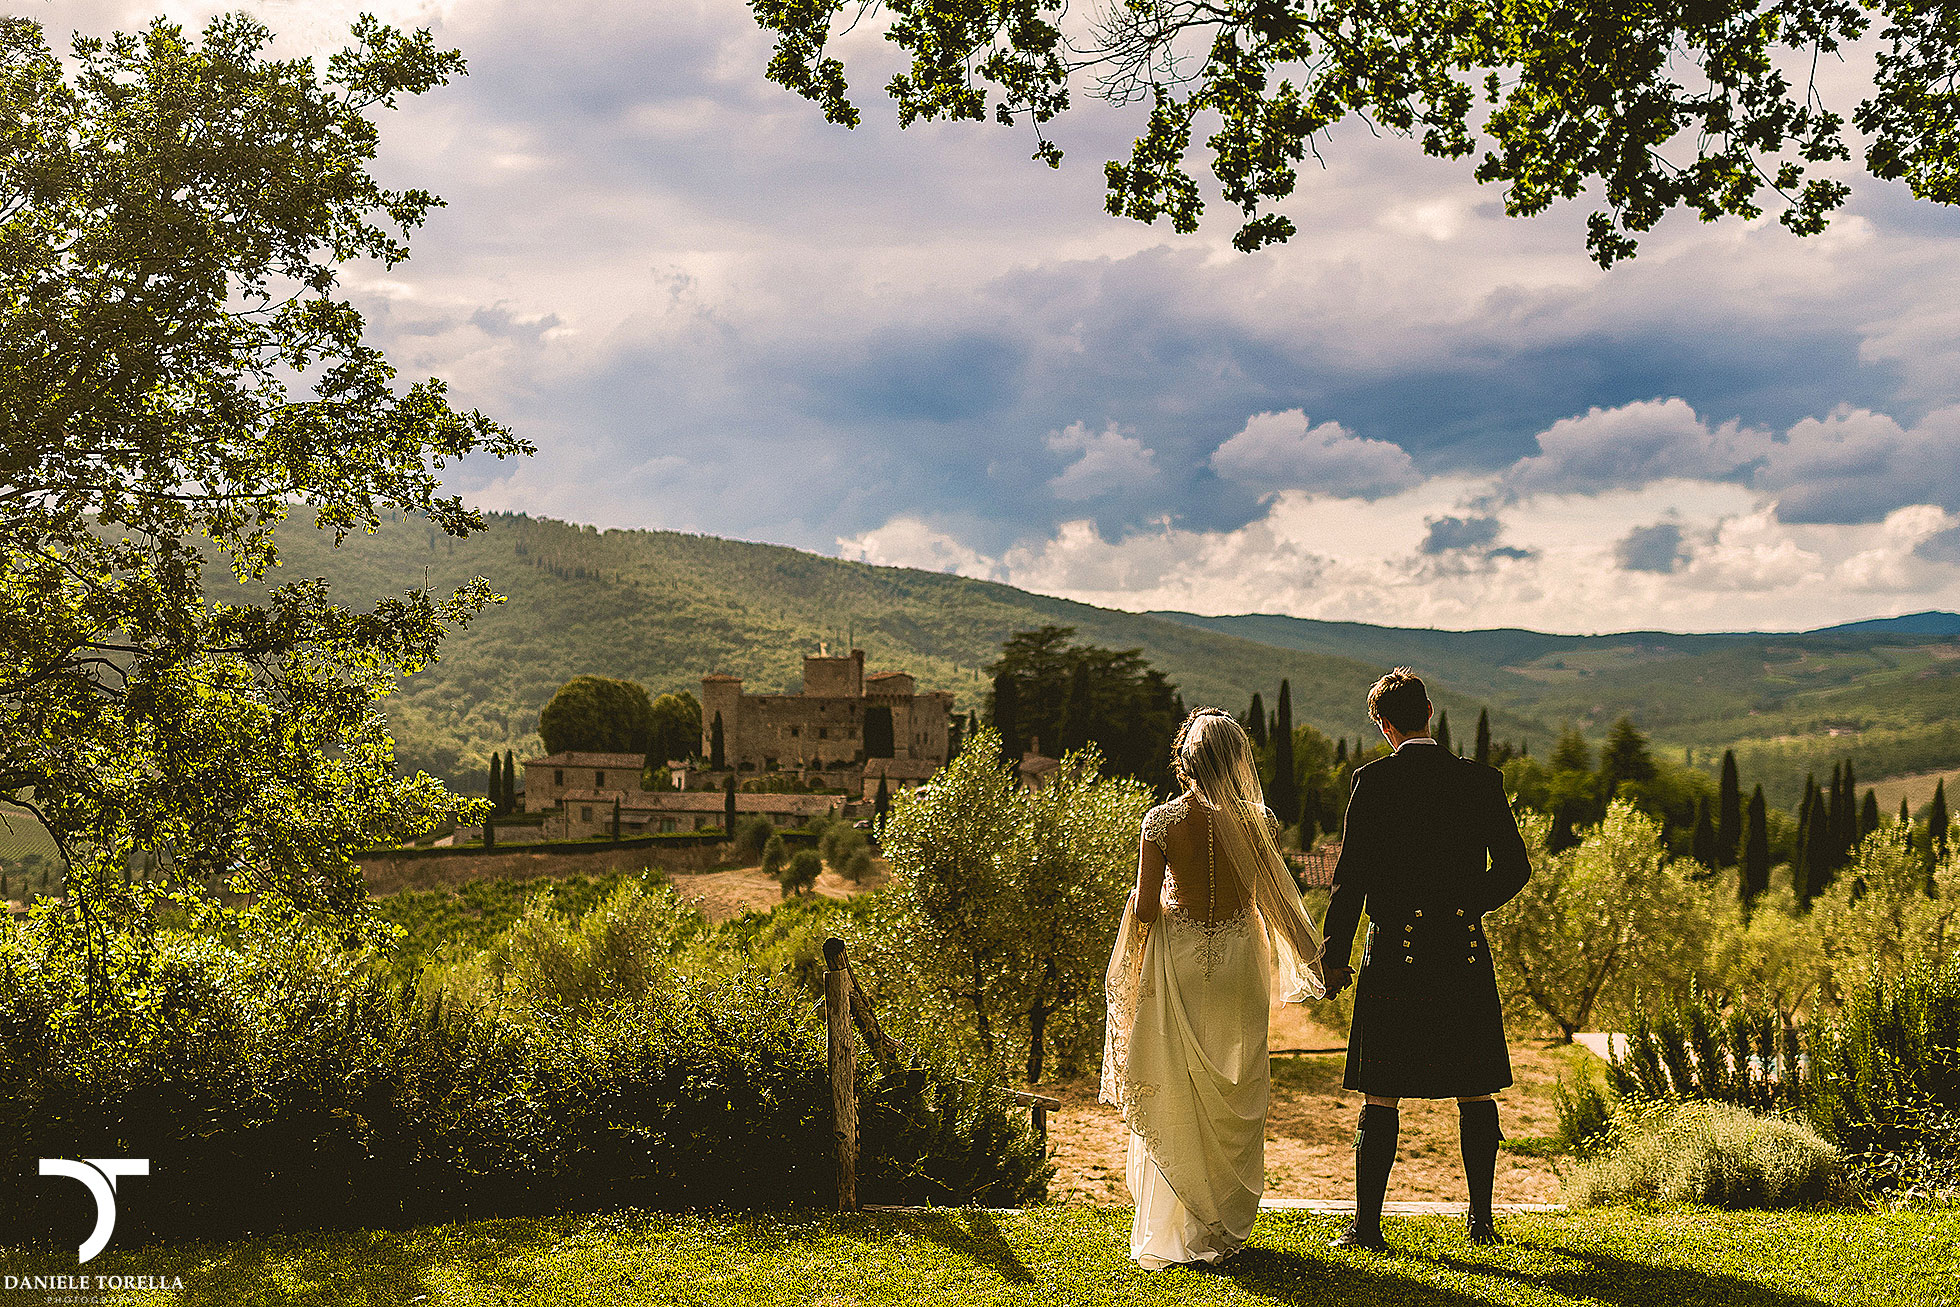 Wedding Castello di Meleto Tuscany Photographer Daniele Torella